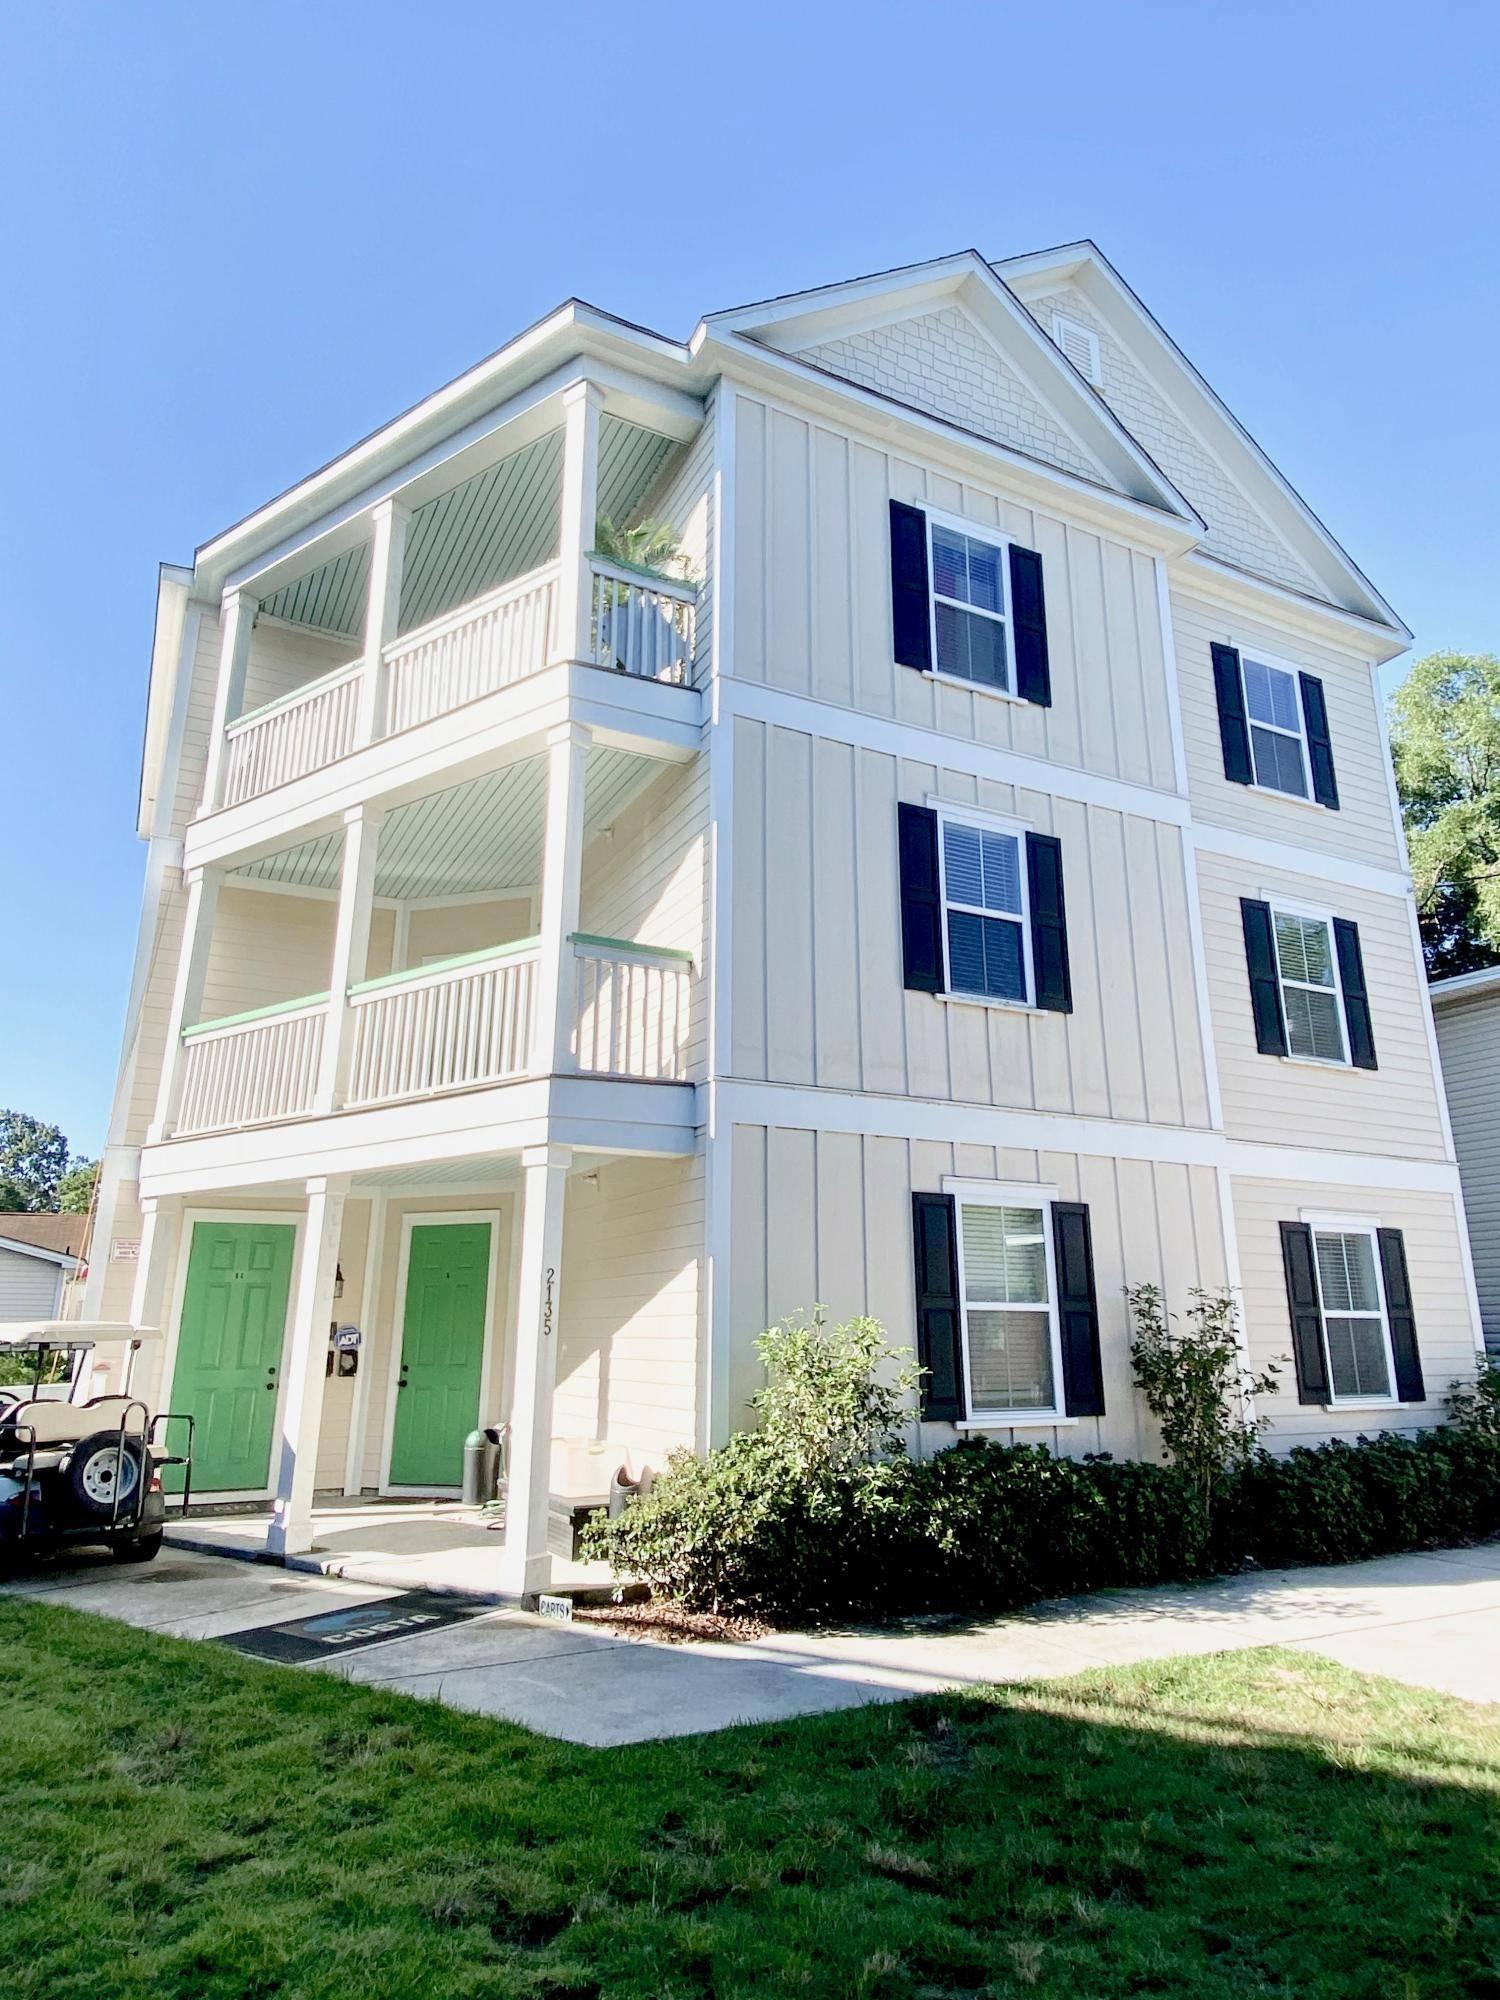 Homes for sale - 2135 Montford Avenue #A, B, C, Charleston, SC 2940...